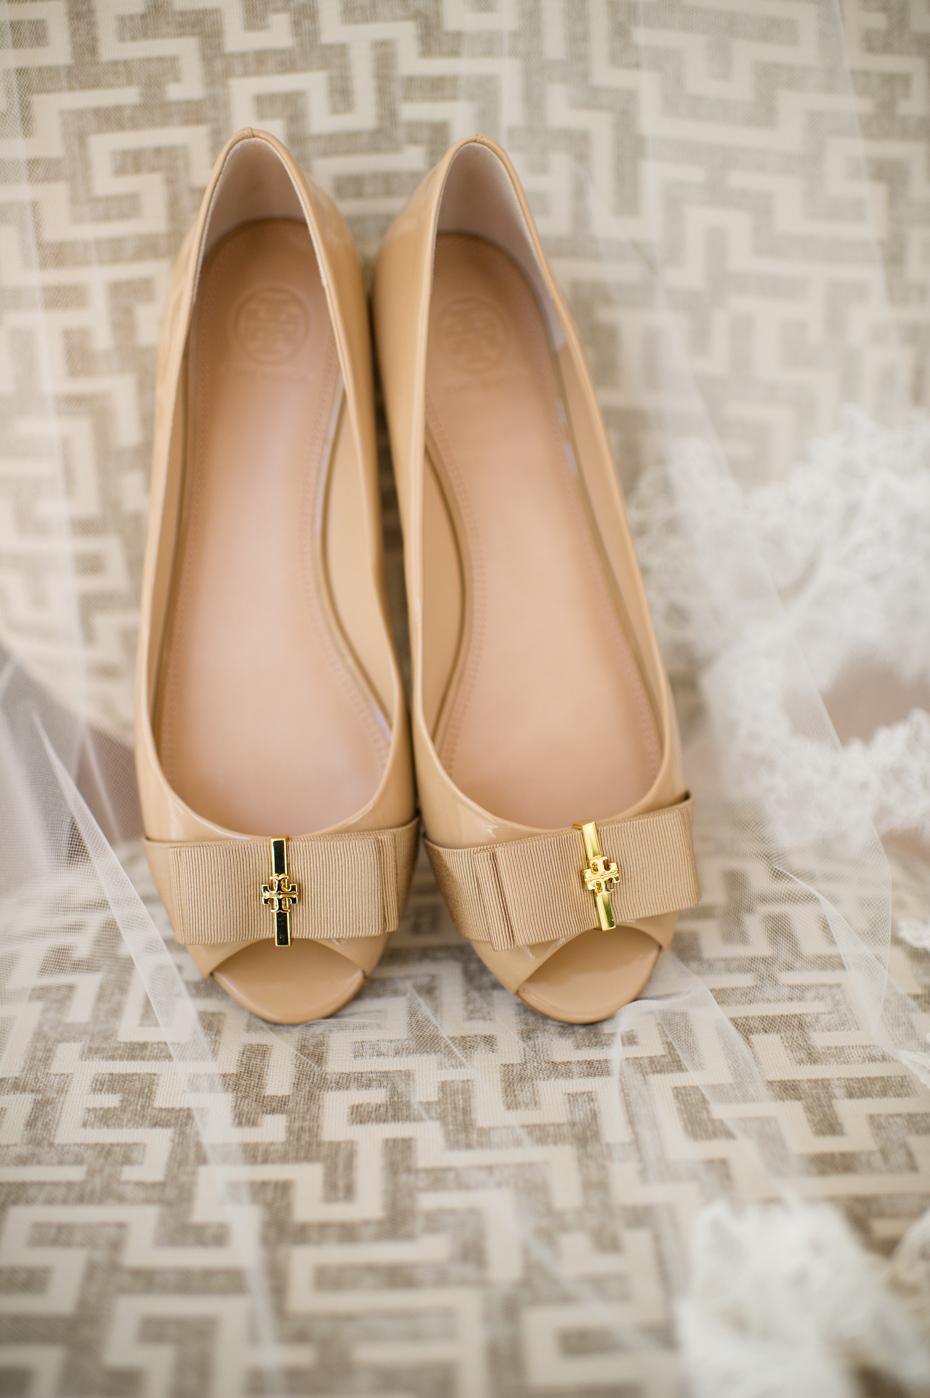 Understated Elegant Wedding Shoes